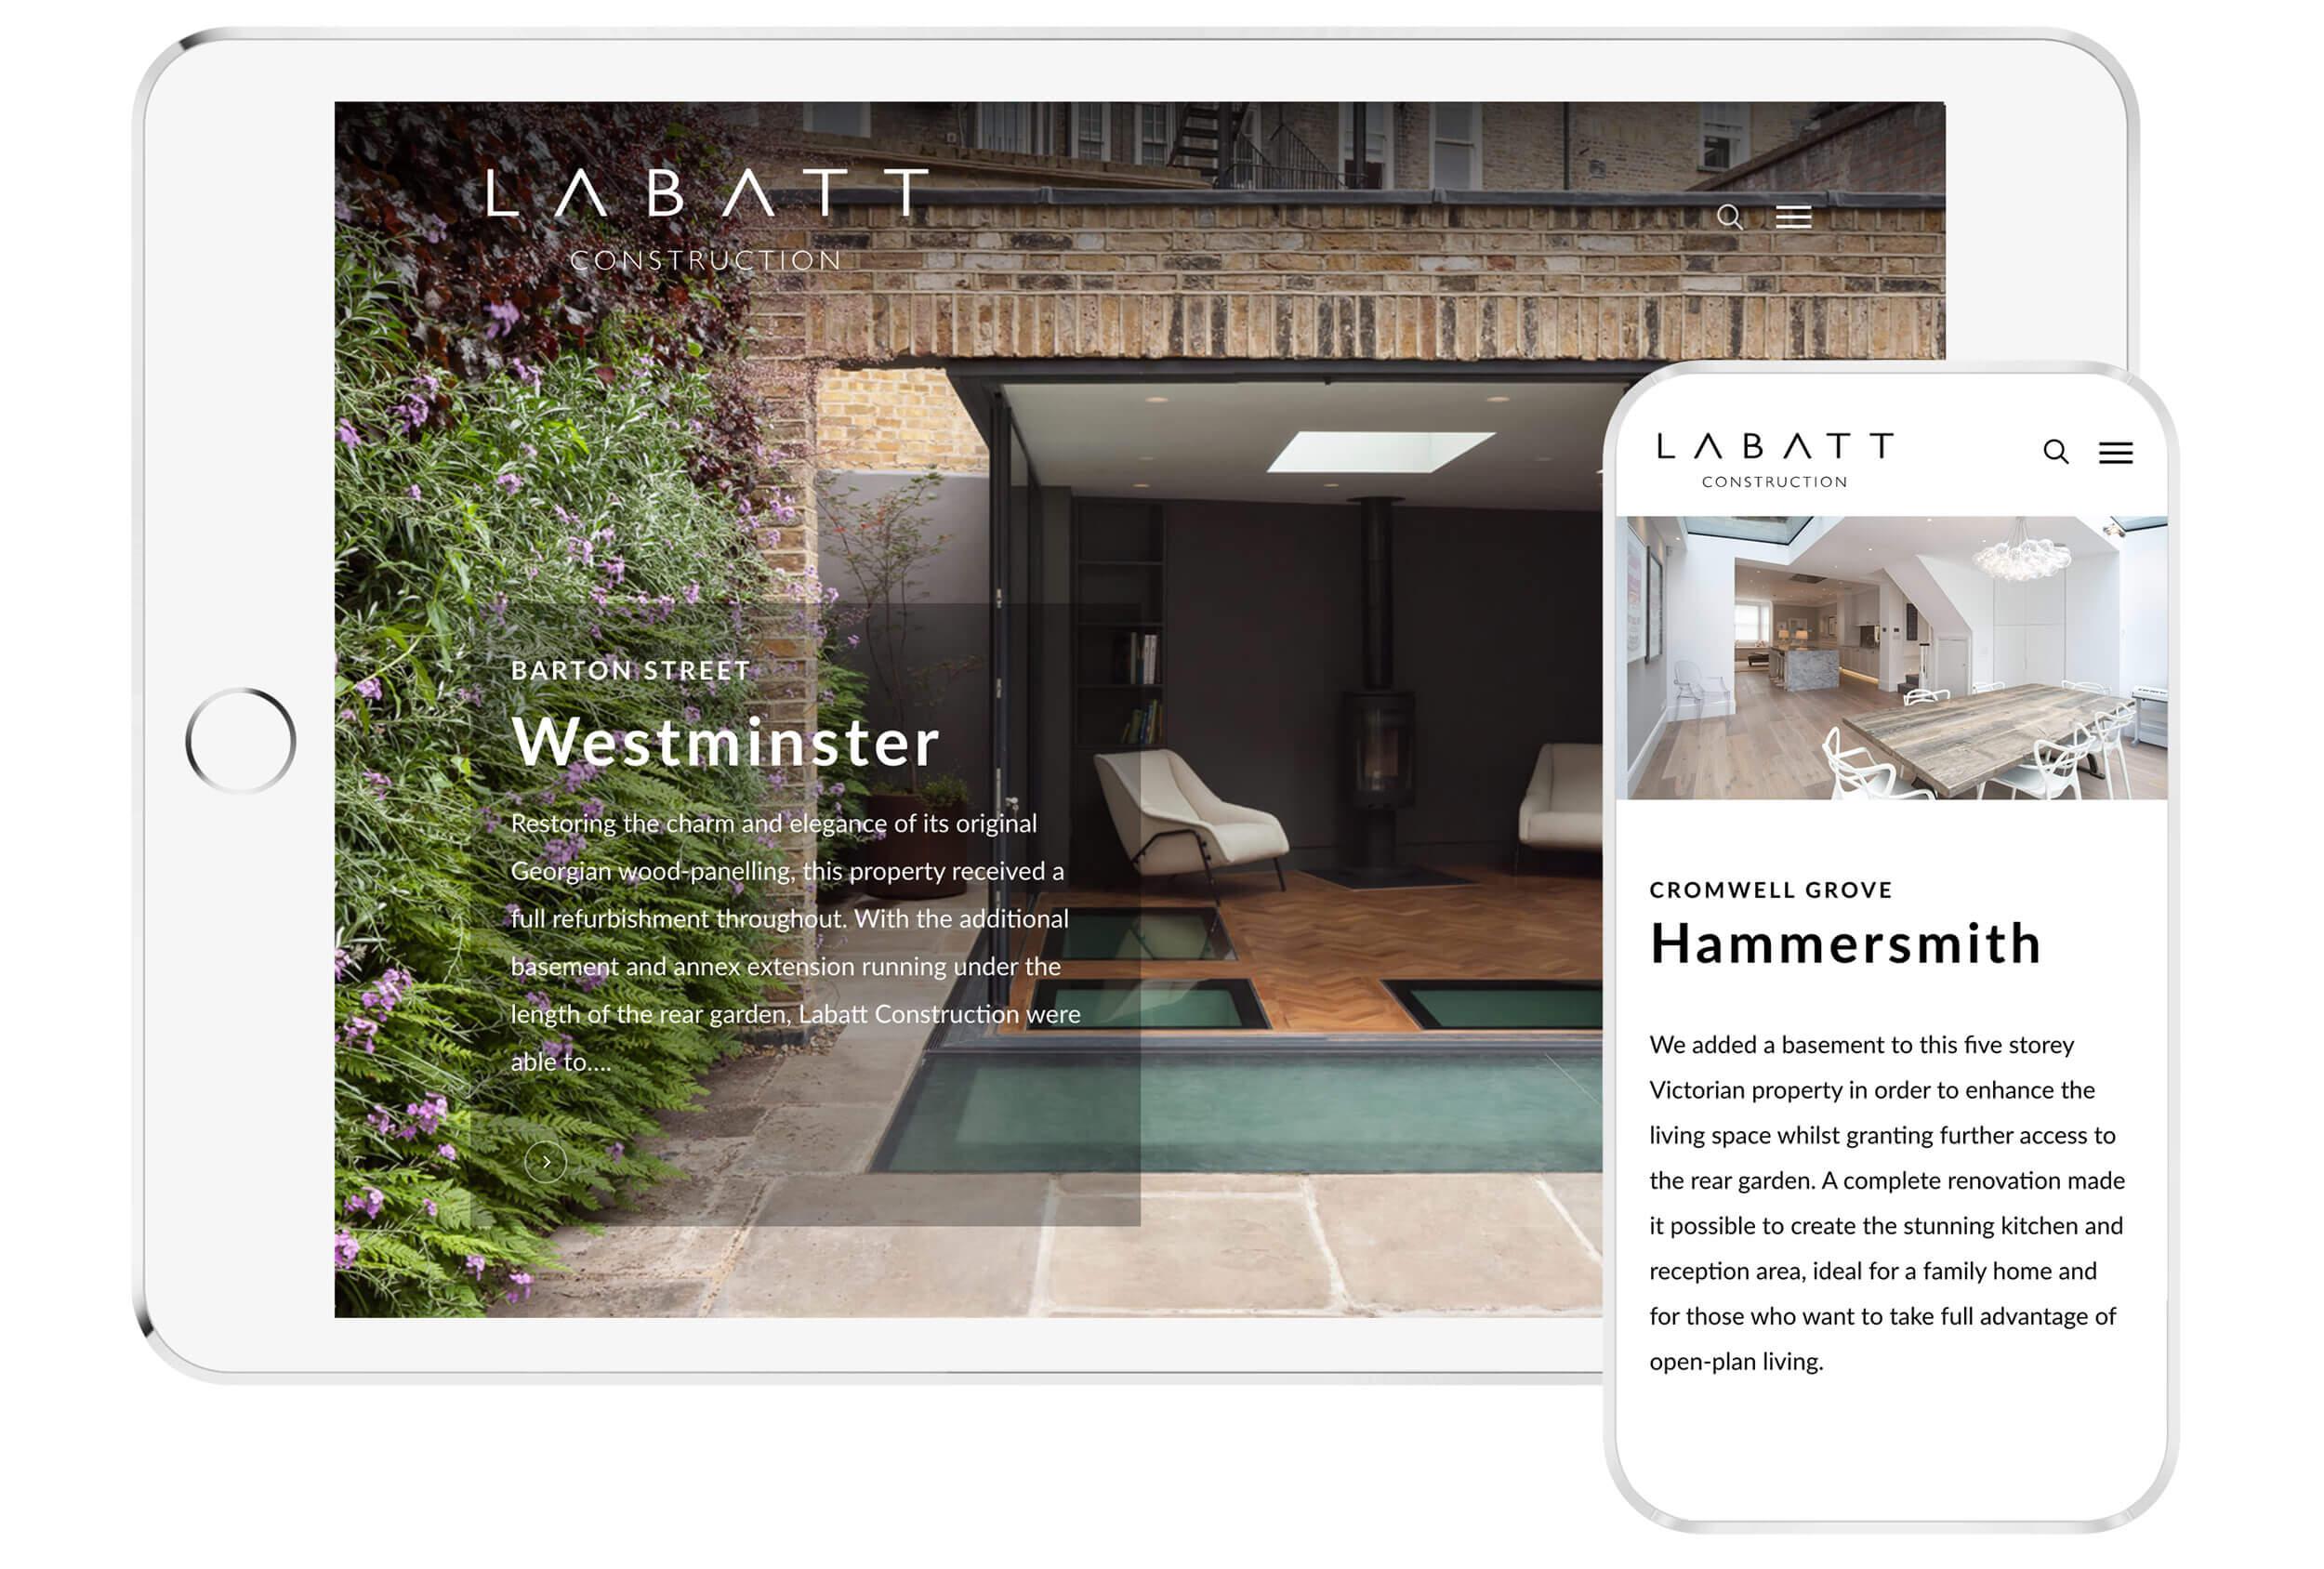 Labatt website mockup ipad iphone